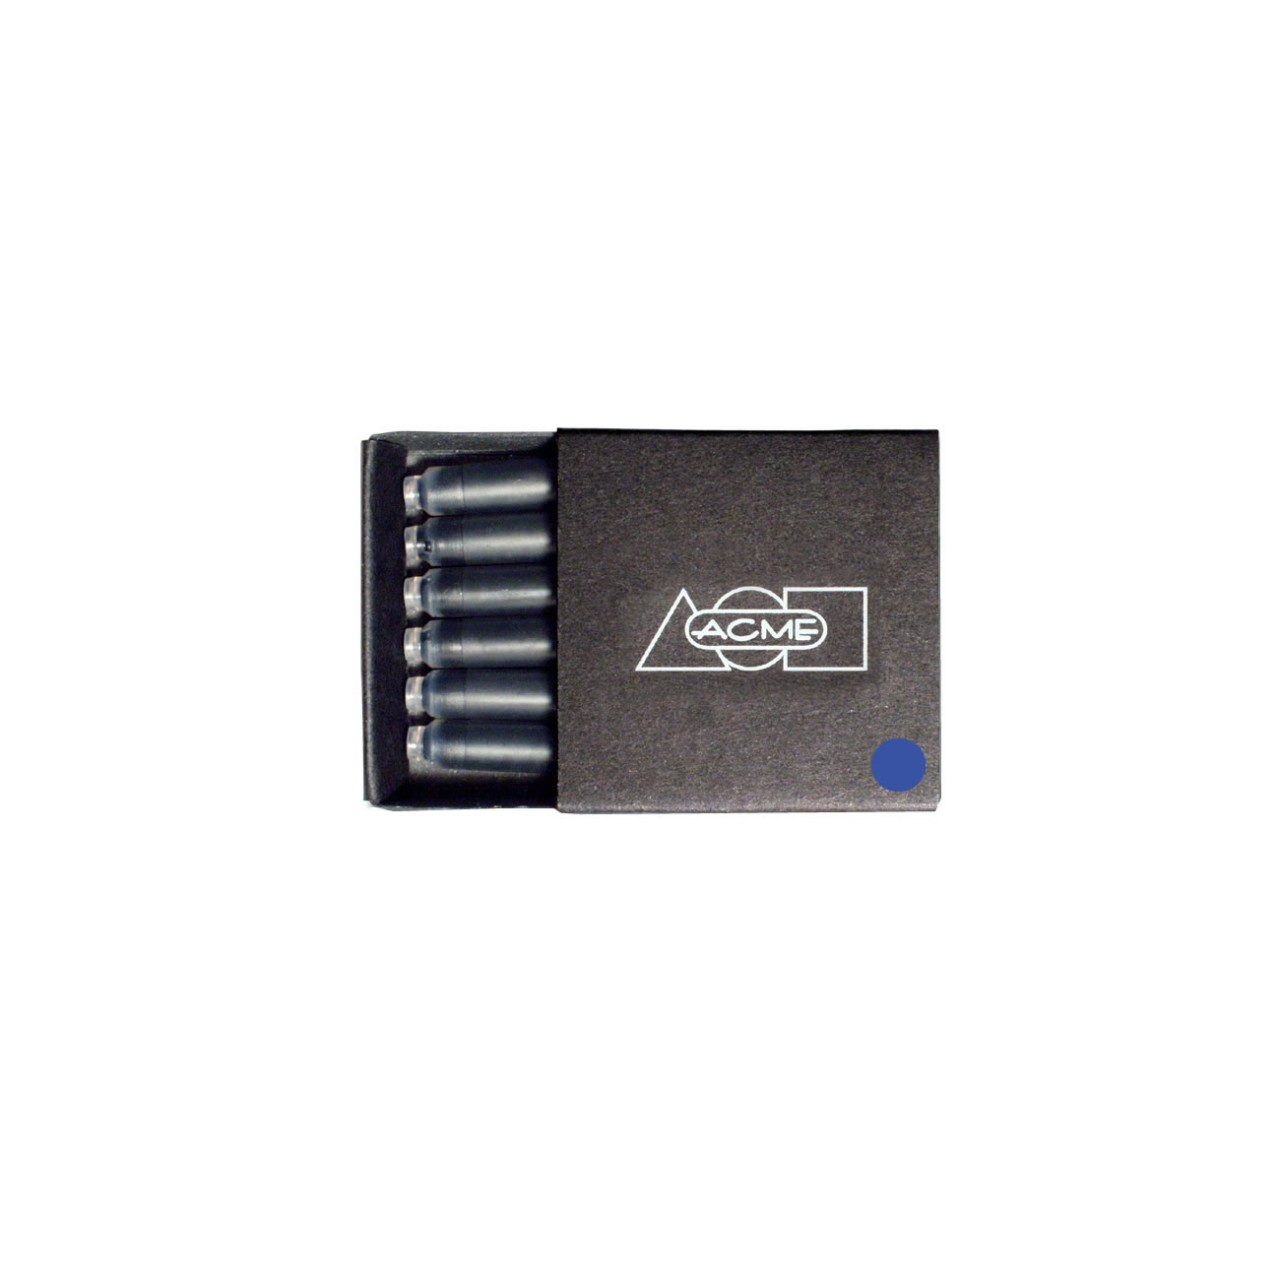 ACME Fountain Cartridges BLUE